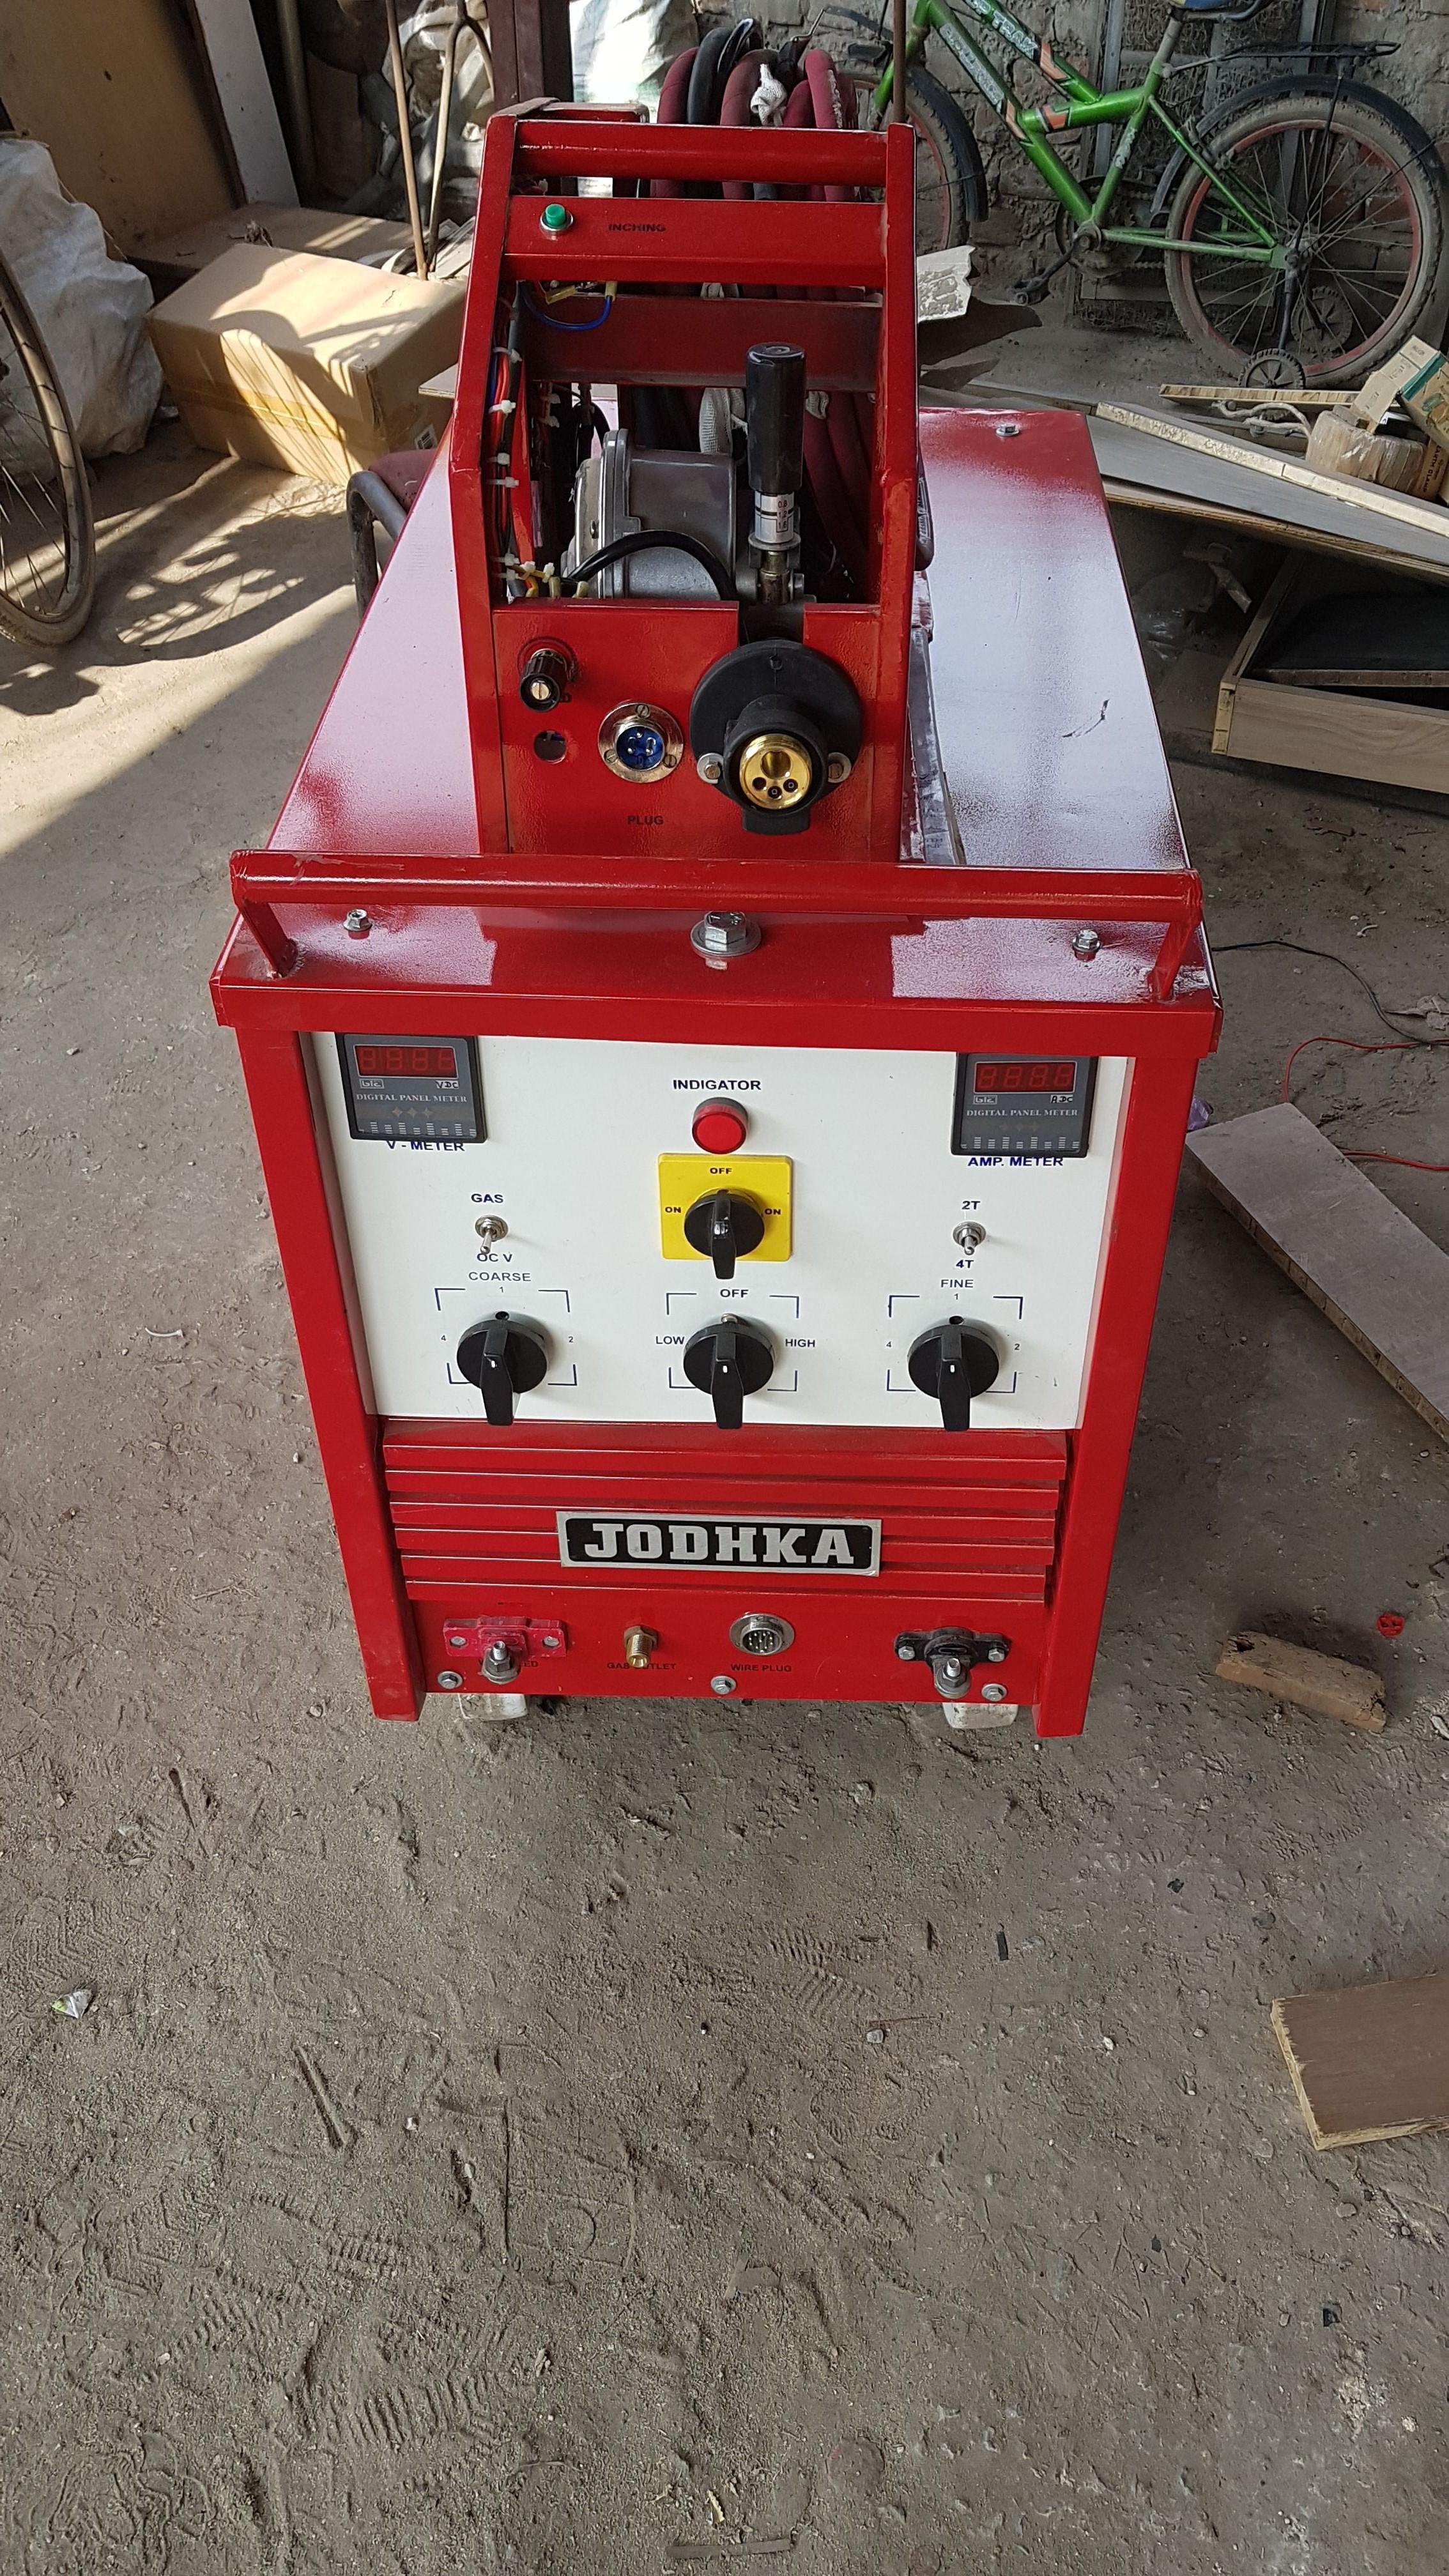 400 amp Mig Welding Machine